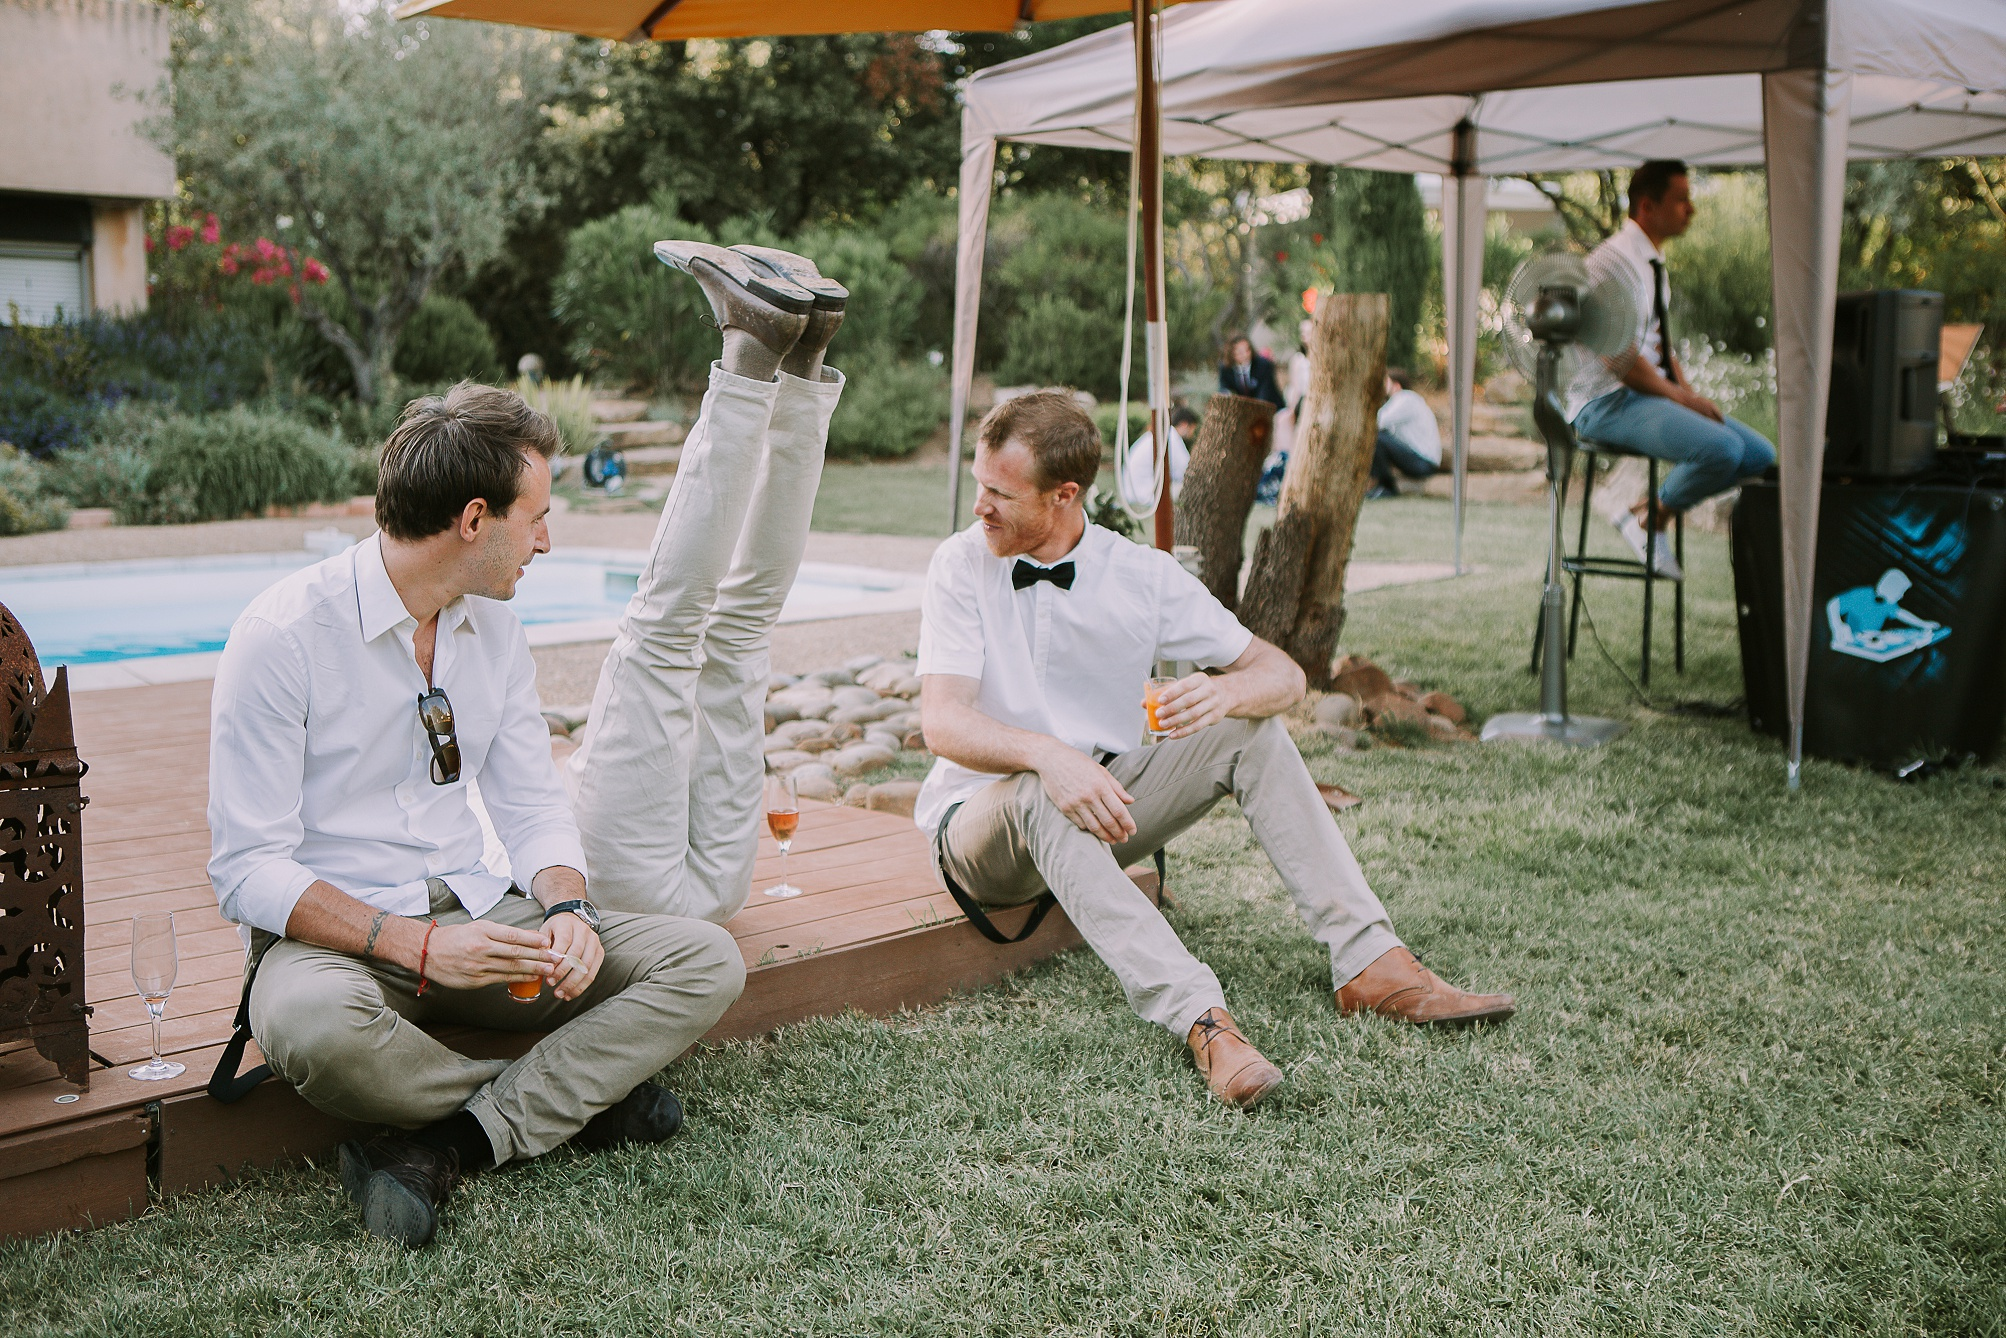 katerynaphotos-mariage-photographe-puyloubier-provence-aix-en-provence-sud-de-la-france_0419.jpg